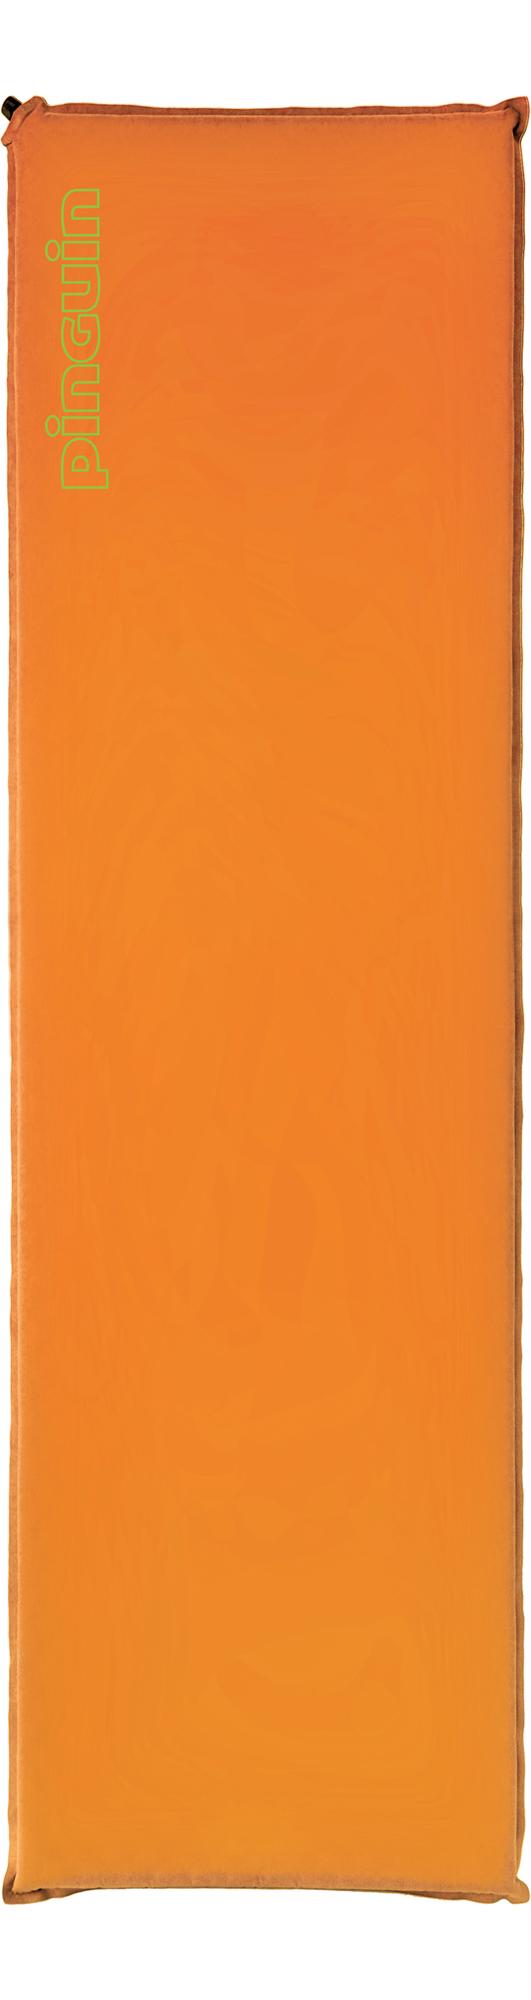 karimatka Horn 20 oranžová